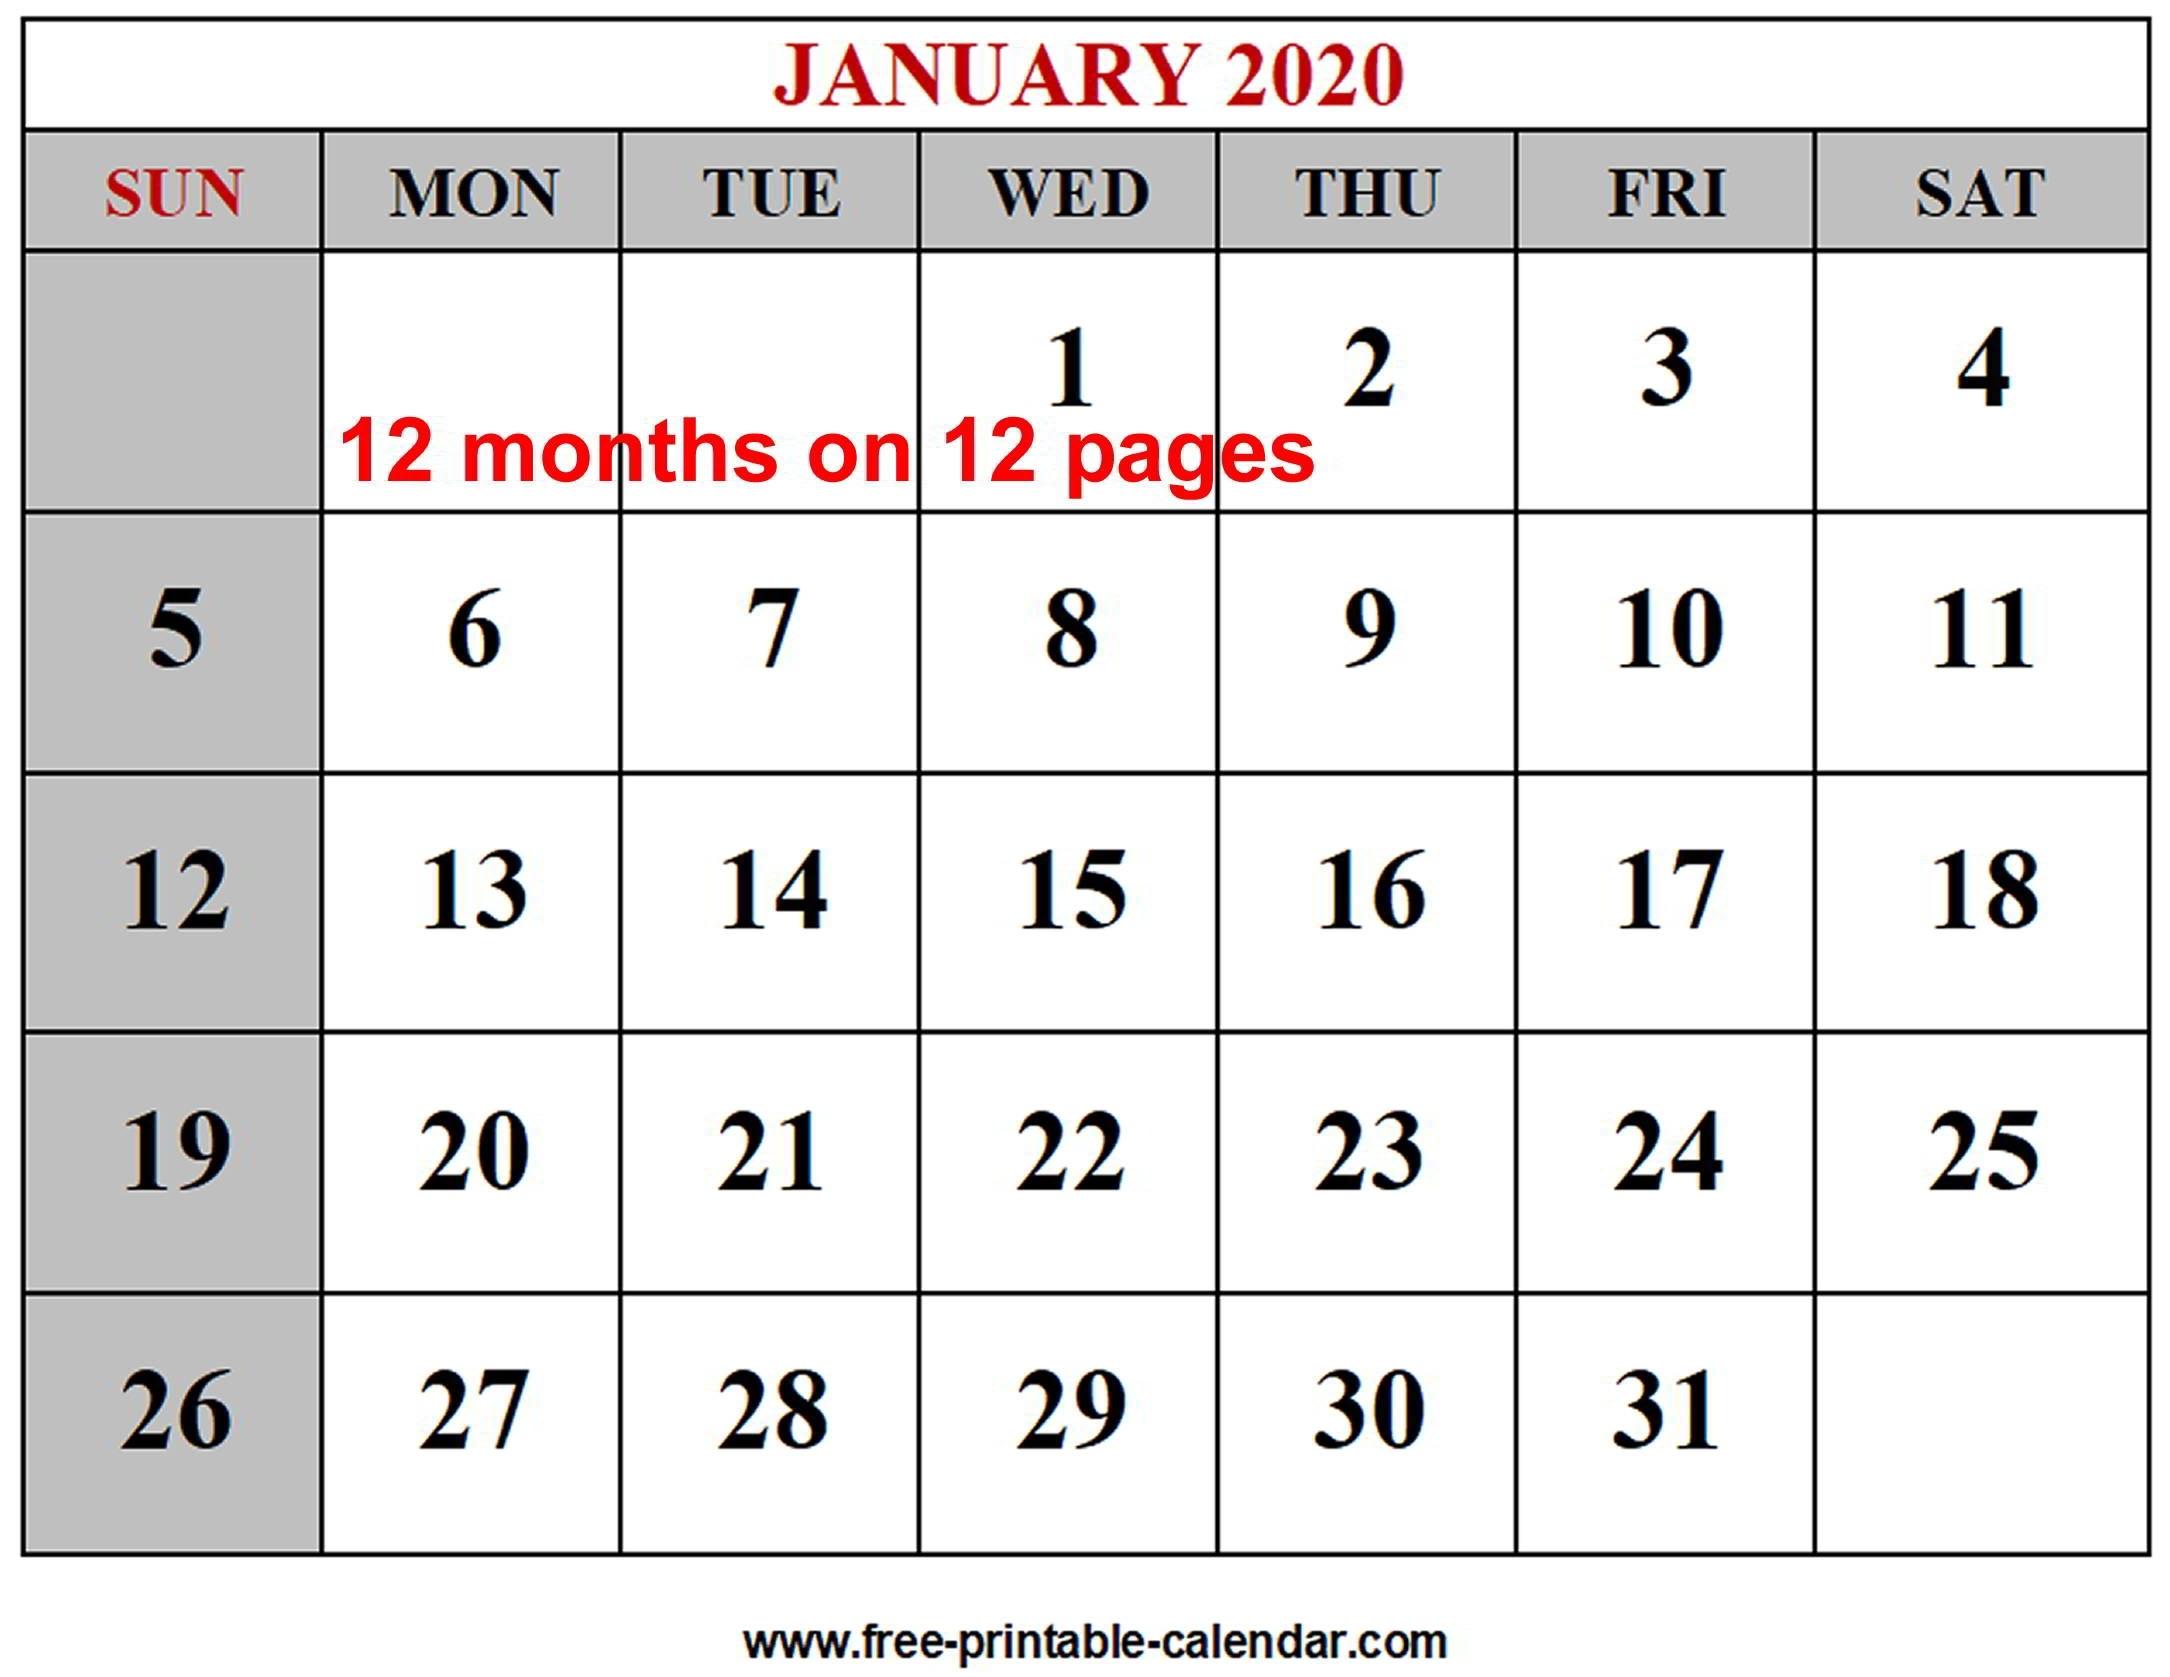 Year 2020 Calendar Templates - Free-Printable-Calendar